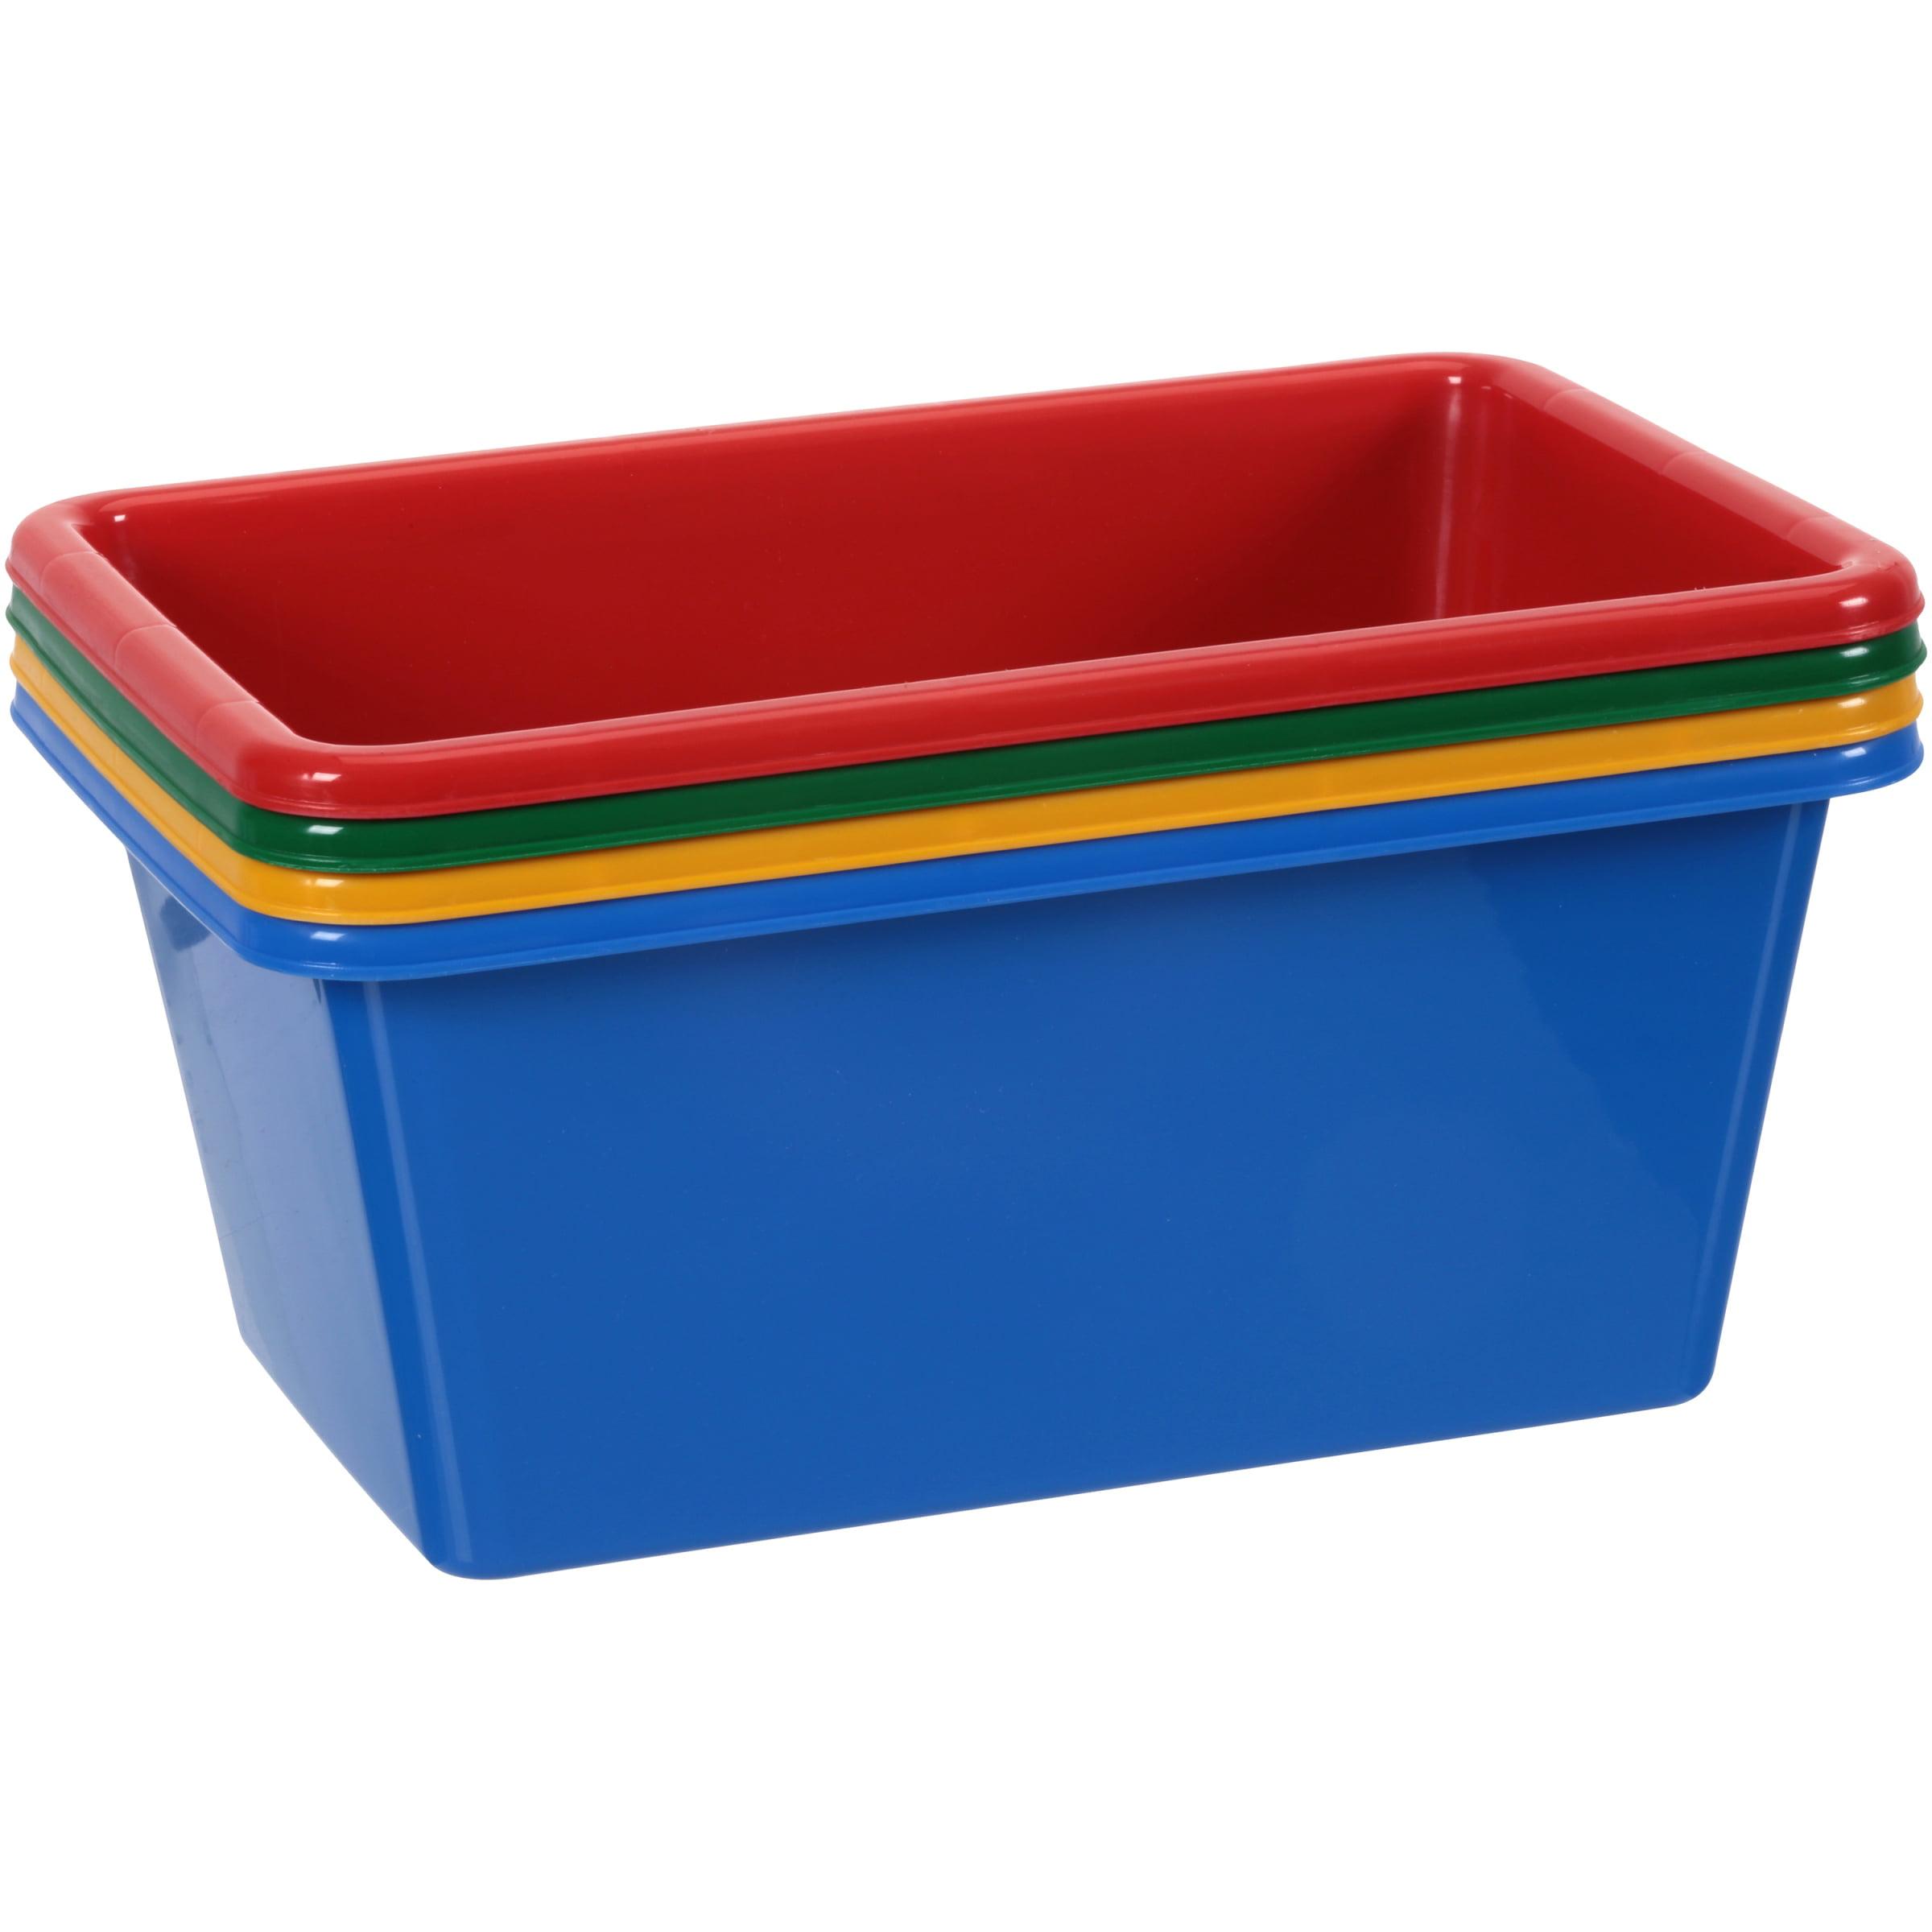 Tot Tutors Small Bins Primary Color Toy Storage Bins 4 ct Pack